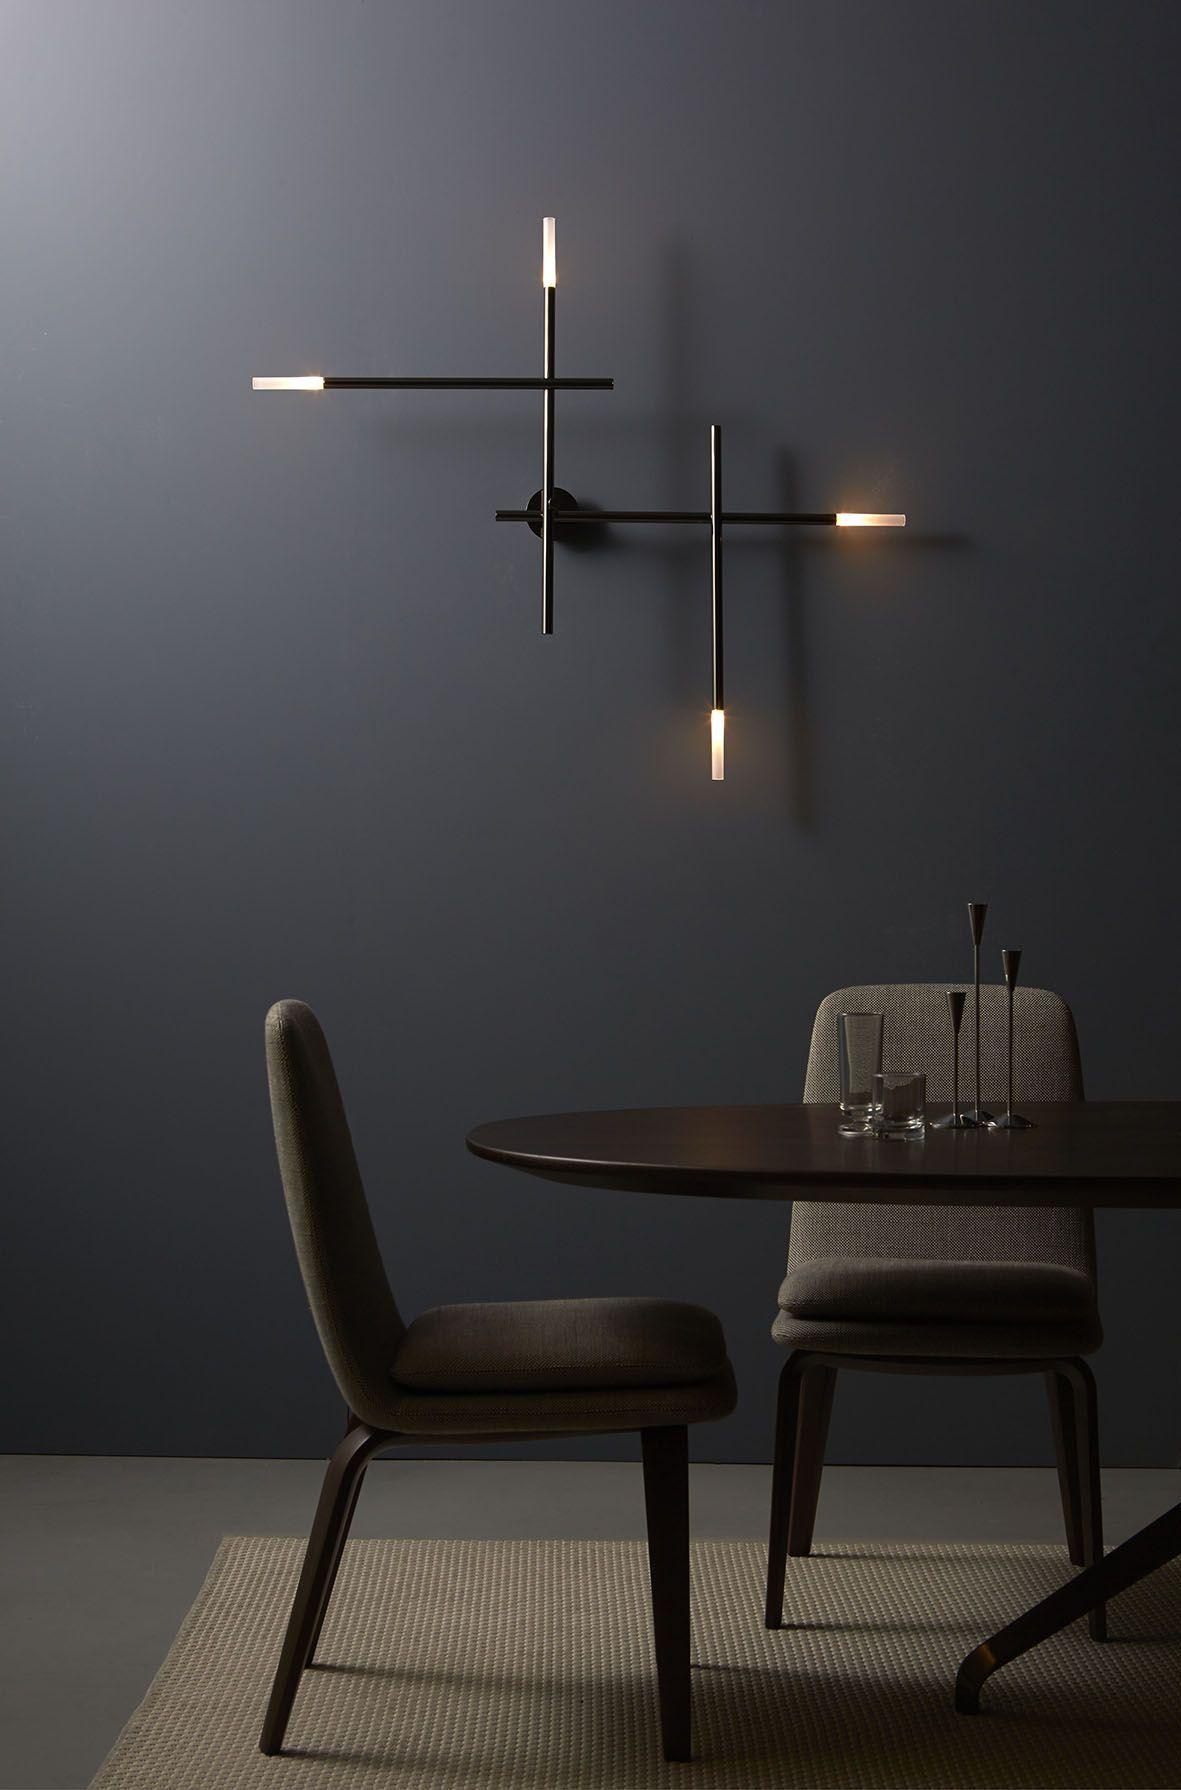 Lampada a muro, design minimale. Wall lamp, simple design. Lampada on grey walls with fireplace, grey walls with design, grey walls with wood furniture, grey walls with art ideas,